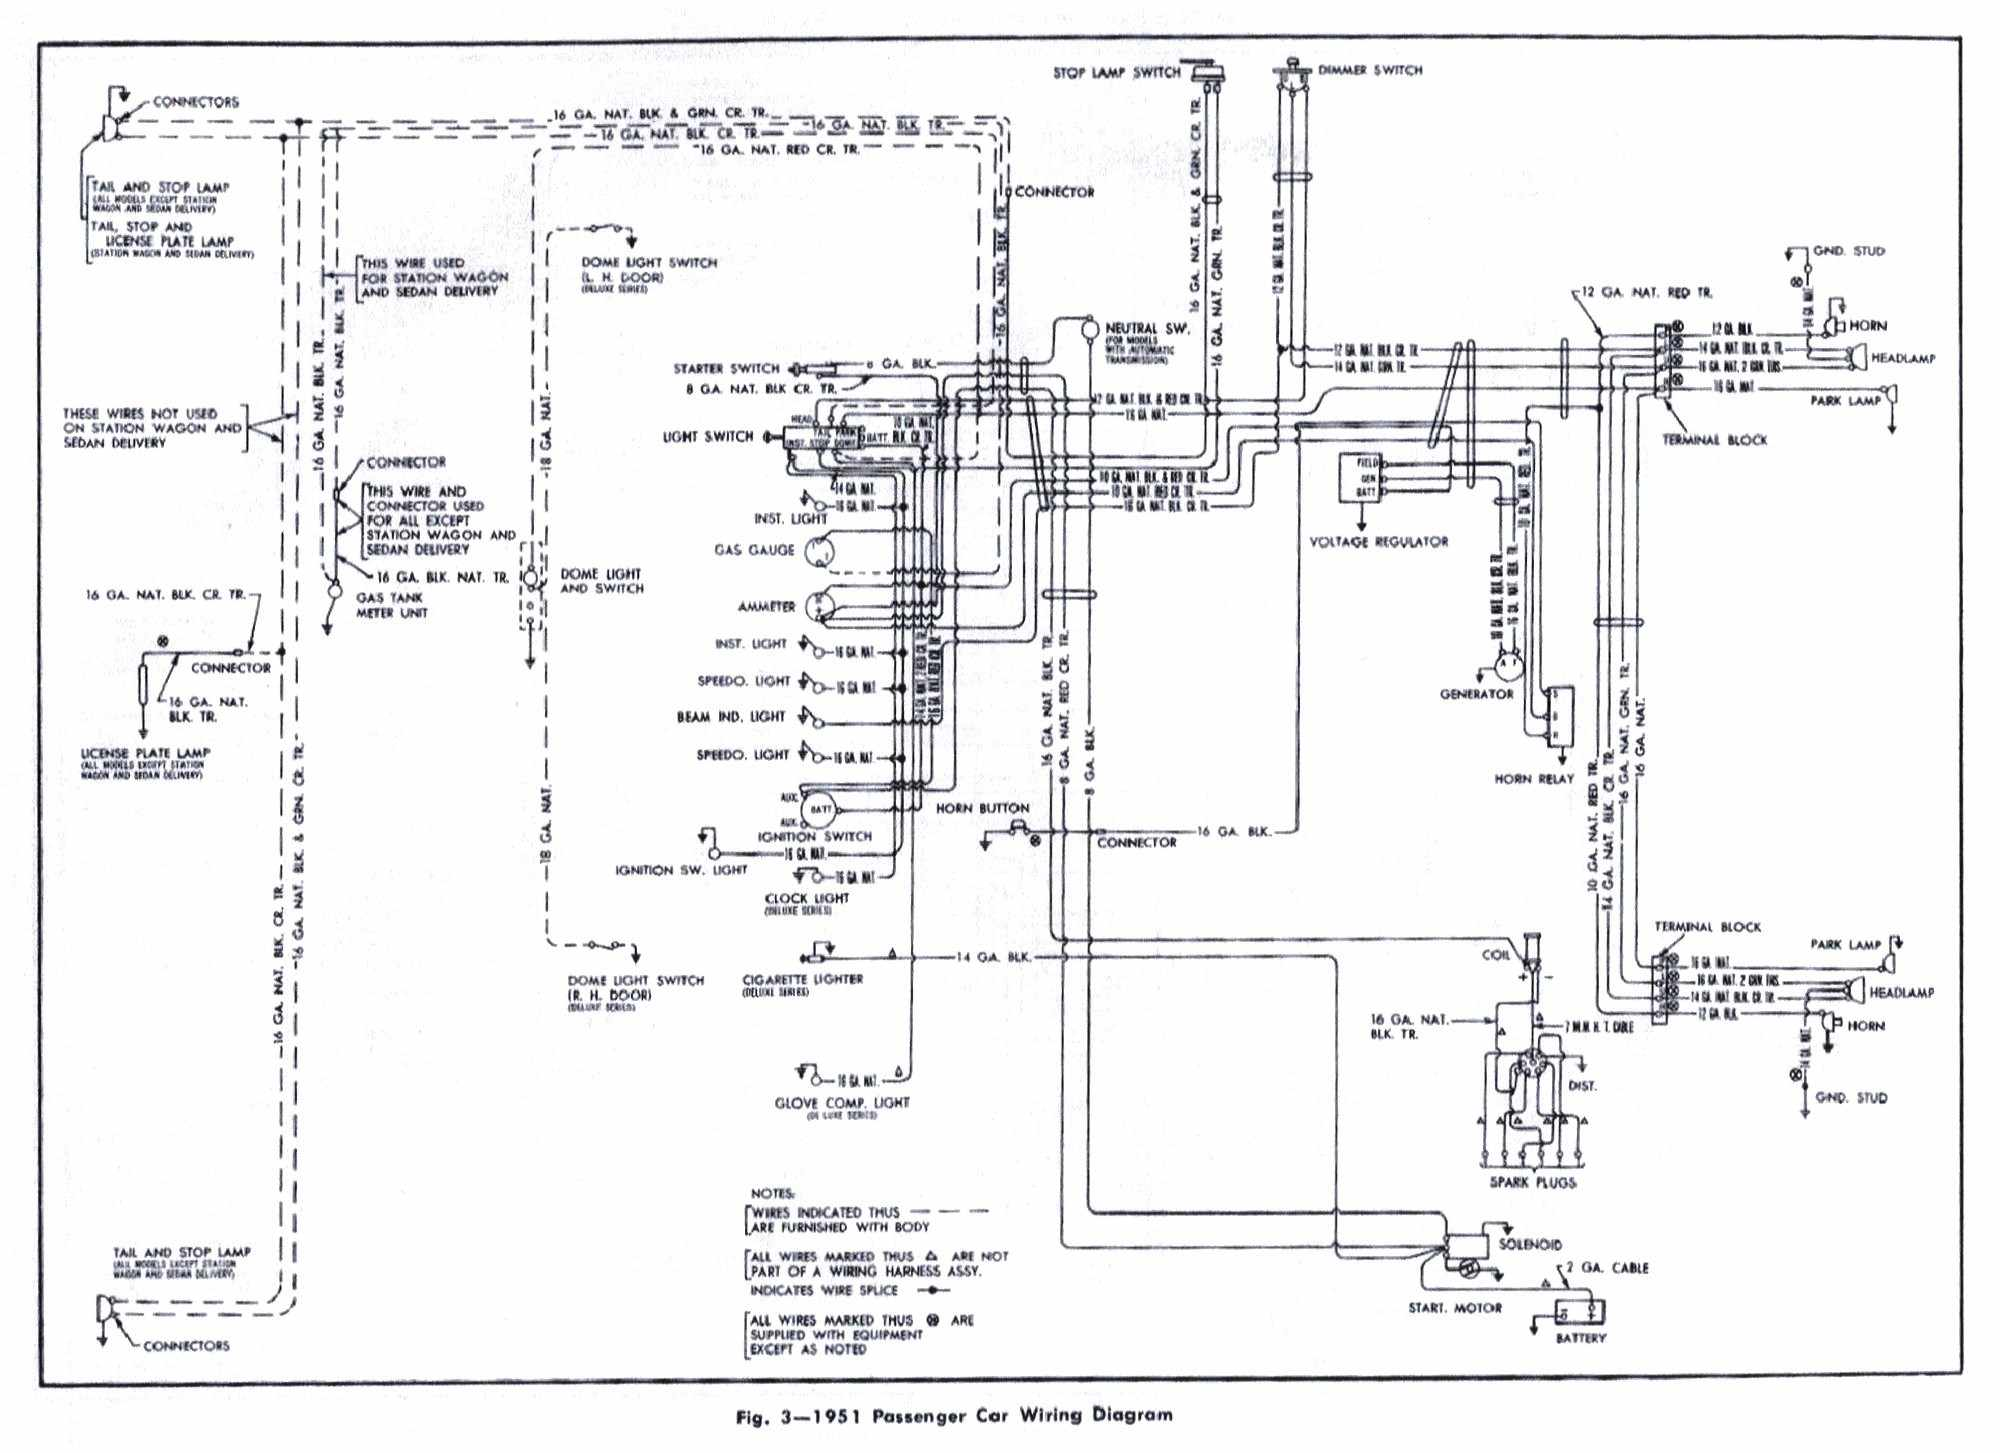 1951 Dodge Wiring Diagram Schematic Third Level Chrysler Cirrus Simca Diagrams Img 2000